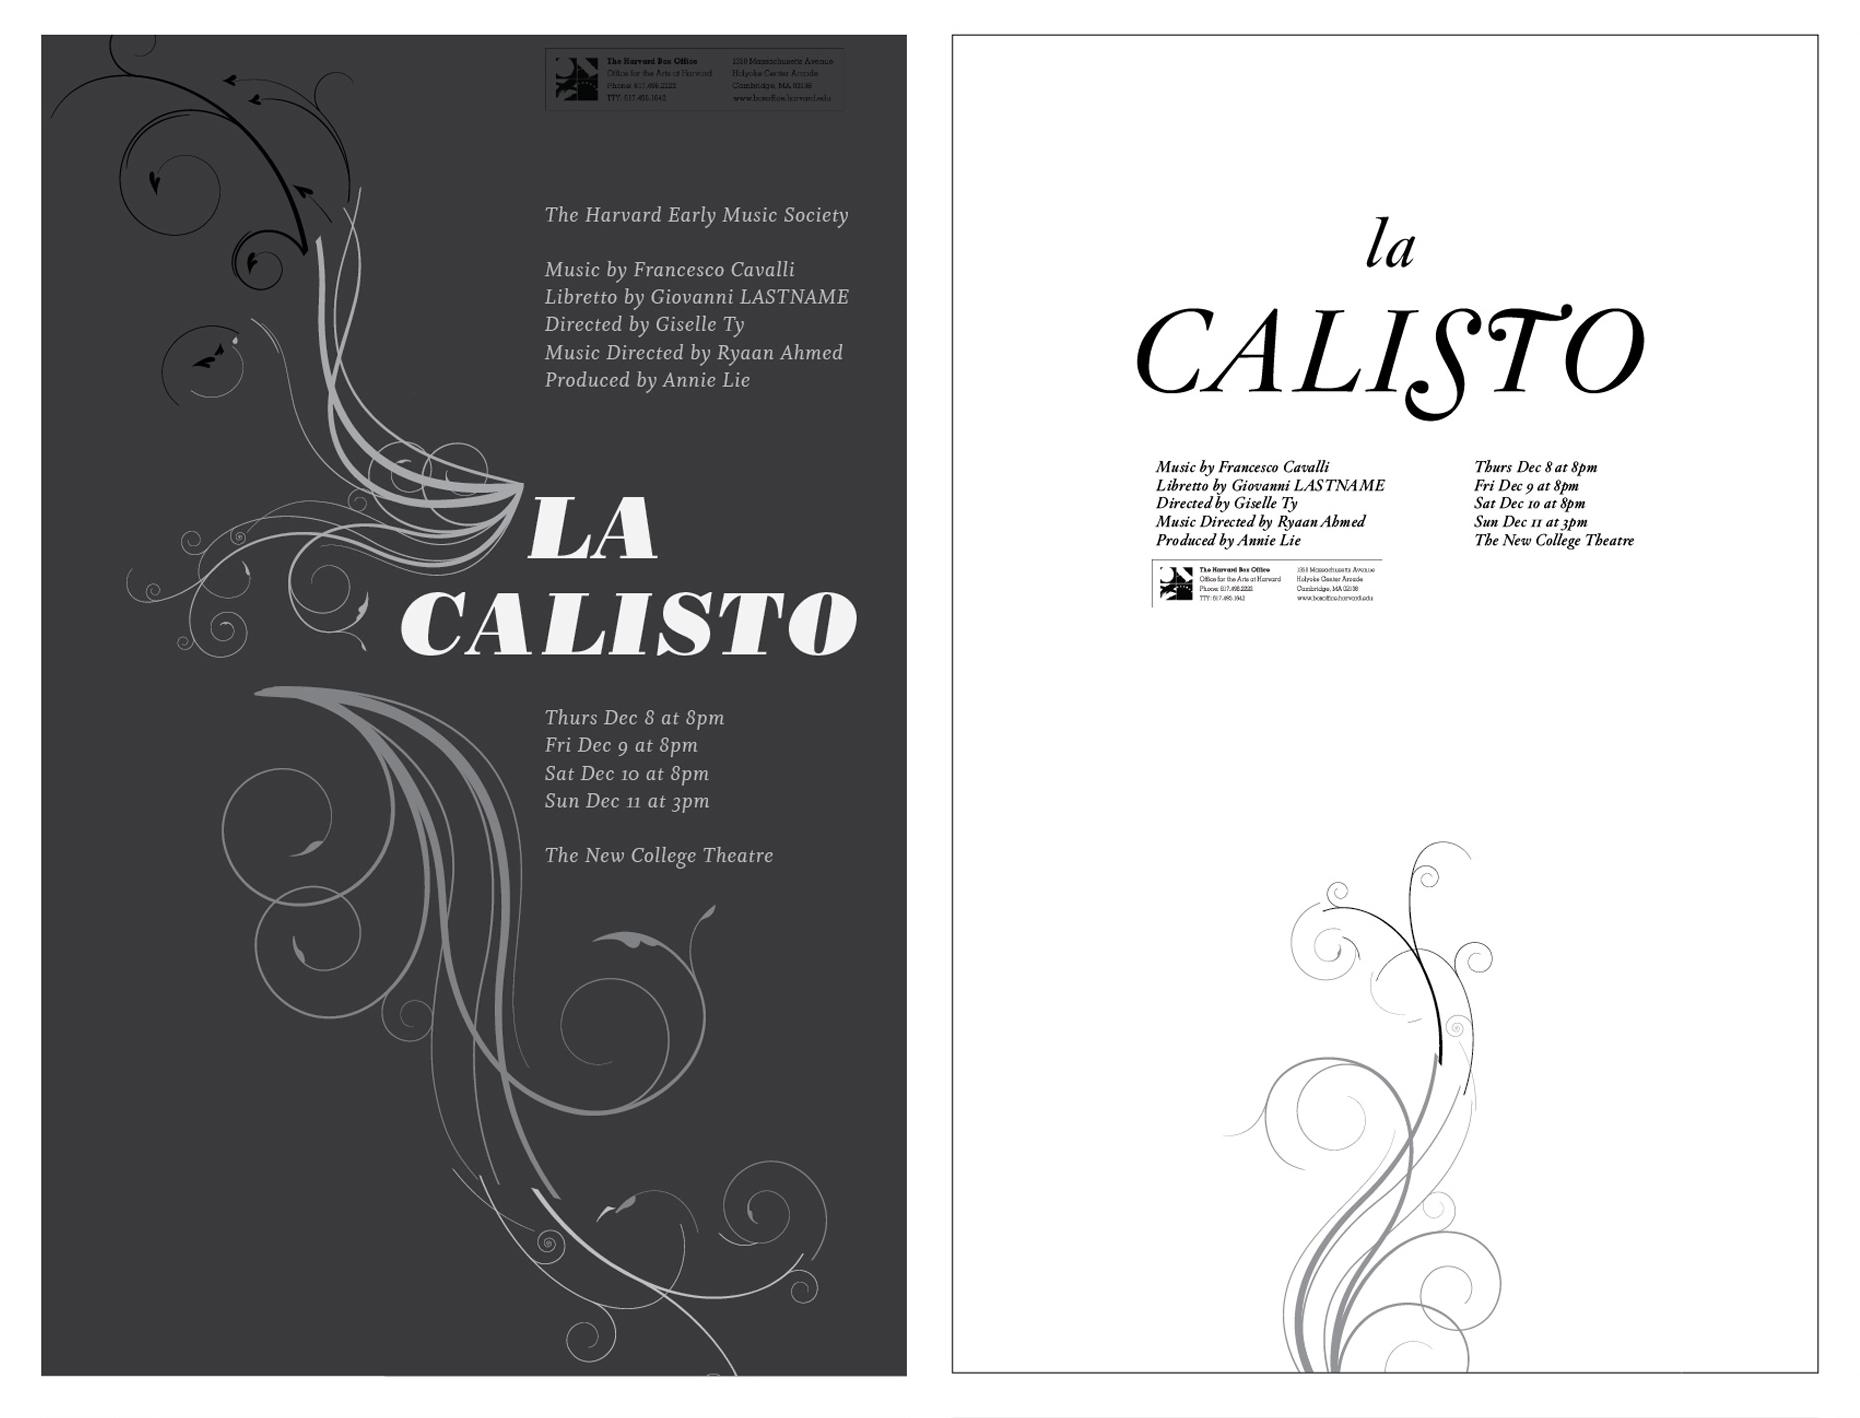 calisto-posters02@2x